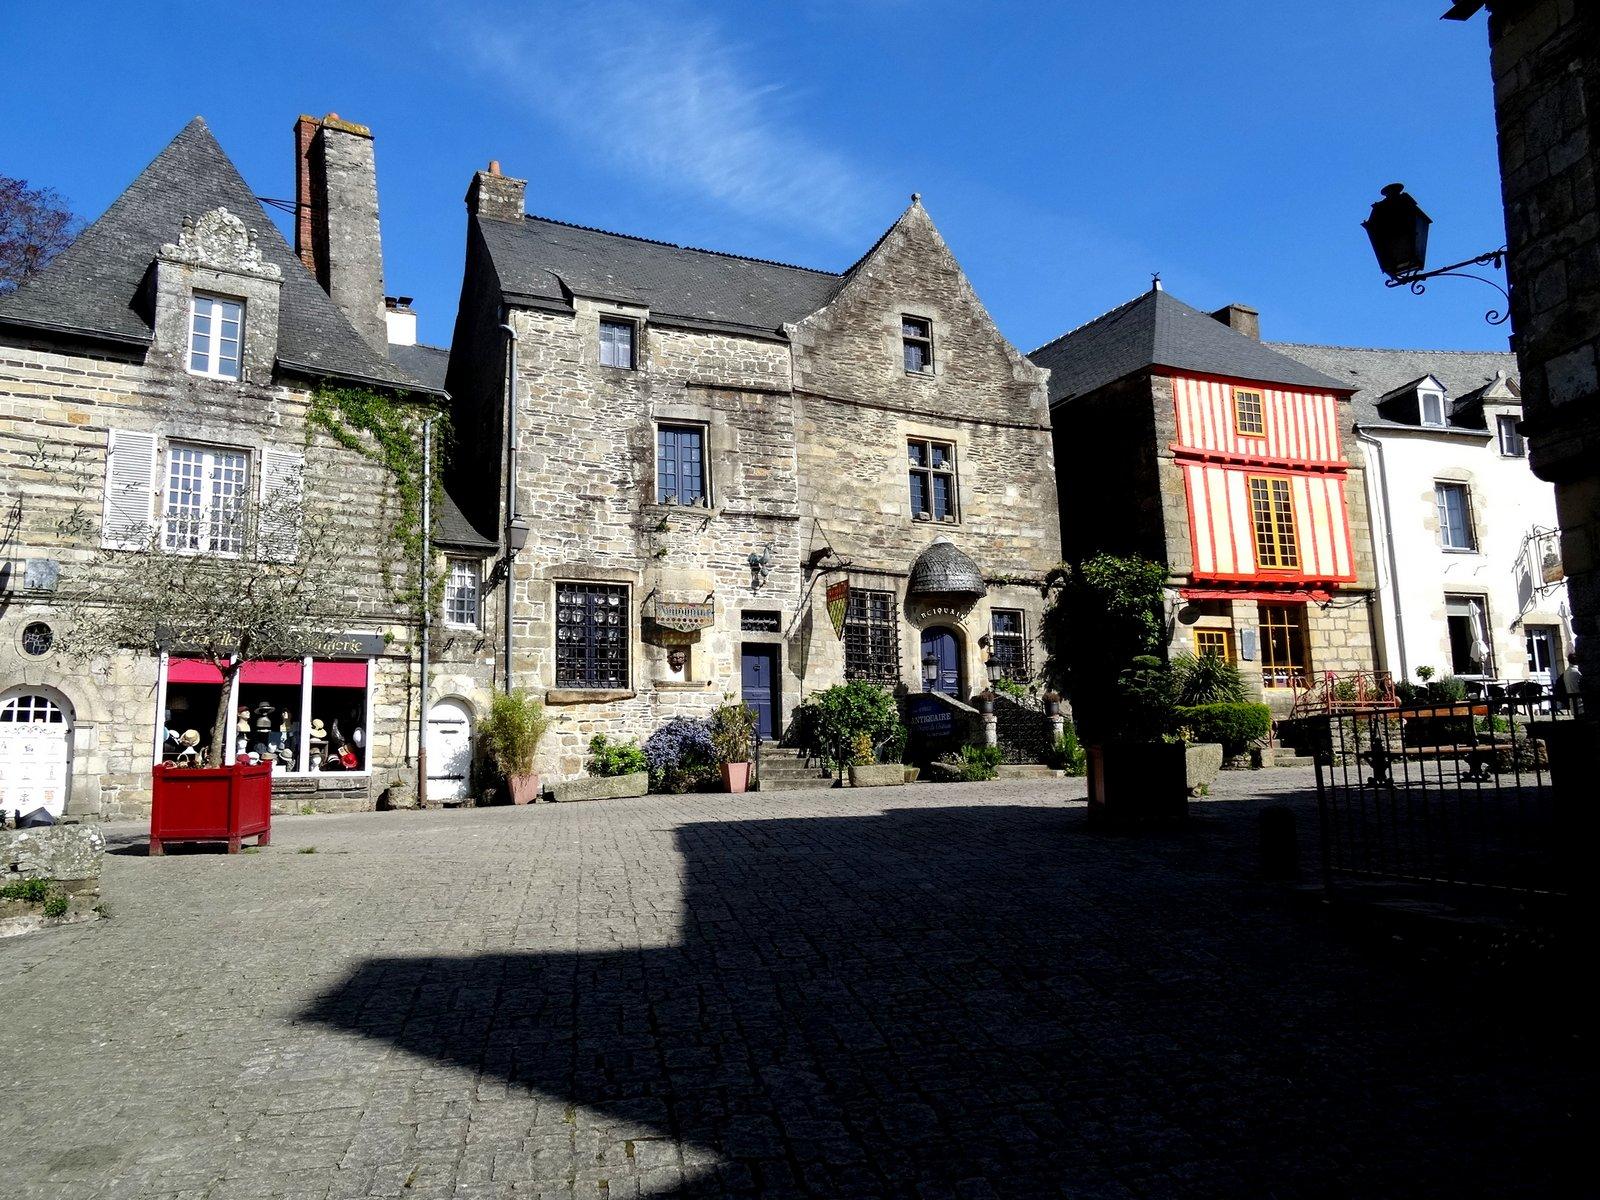 Arrivée à Rochefort en Terre